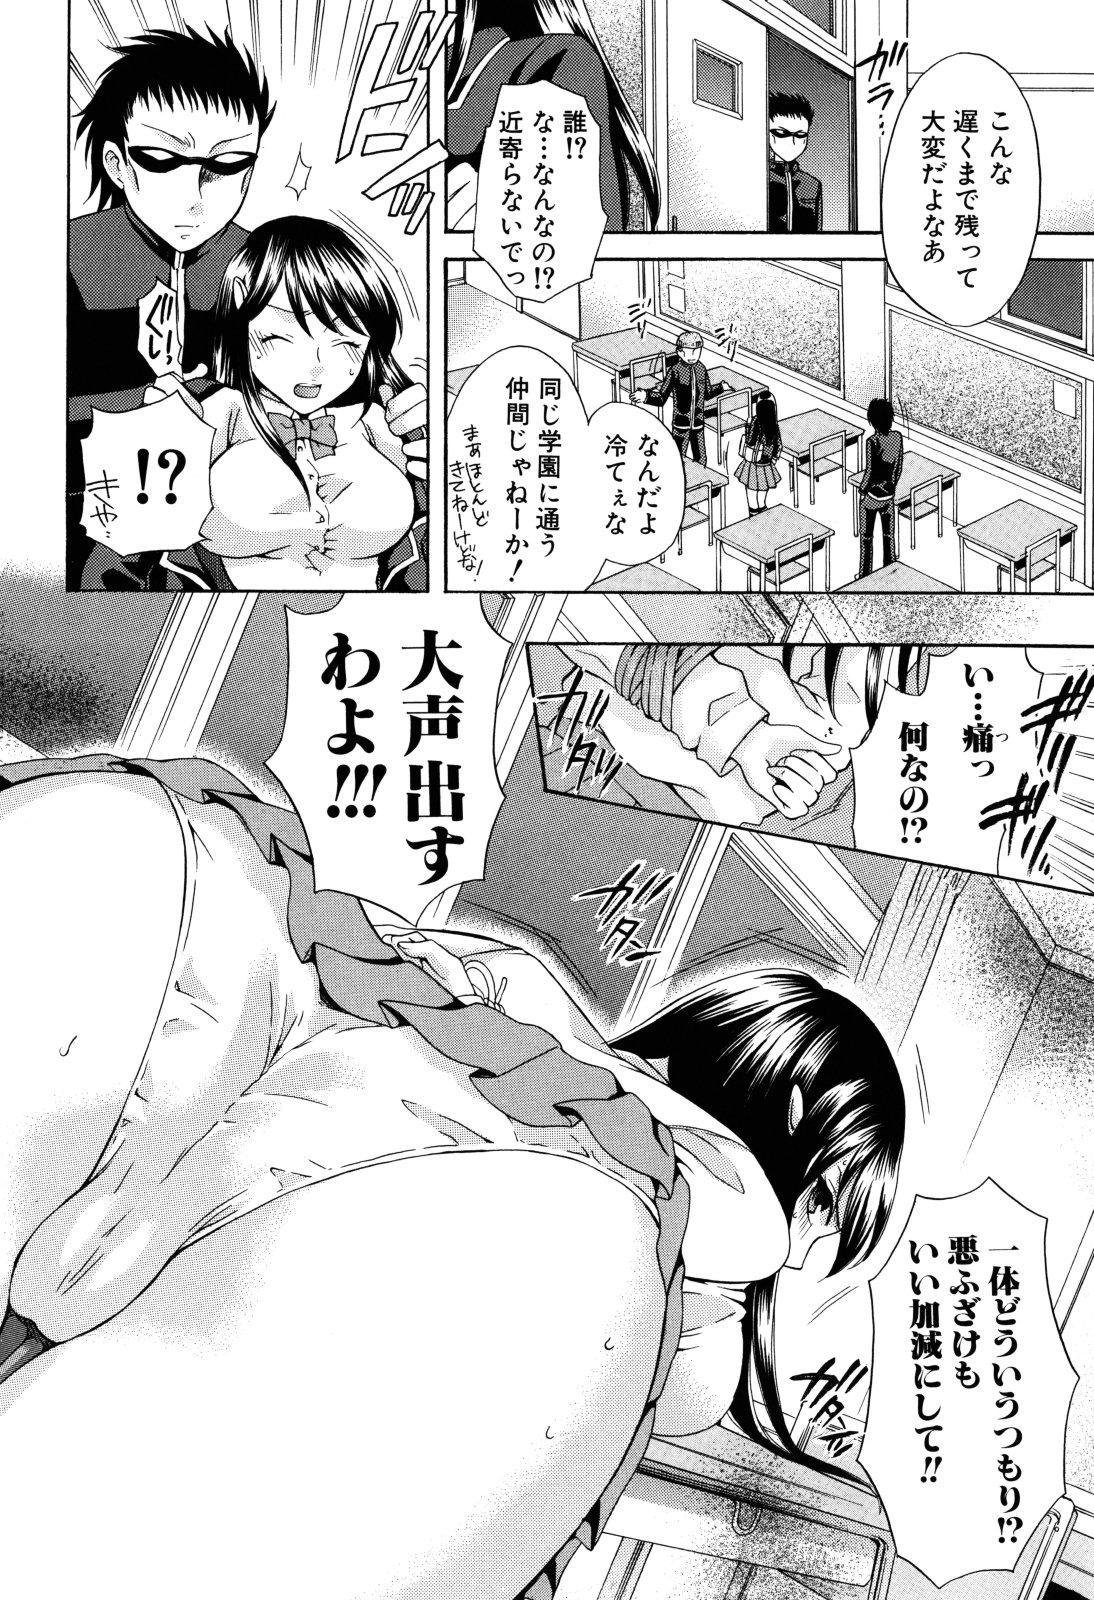 Kanojo ga Ochiru made - She in the depth 149